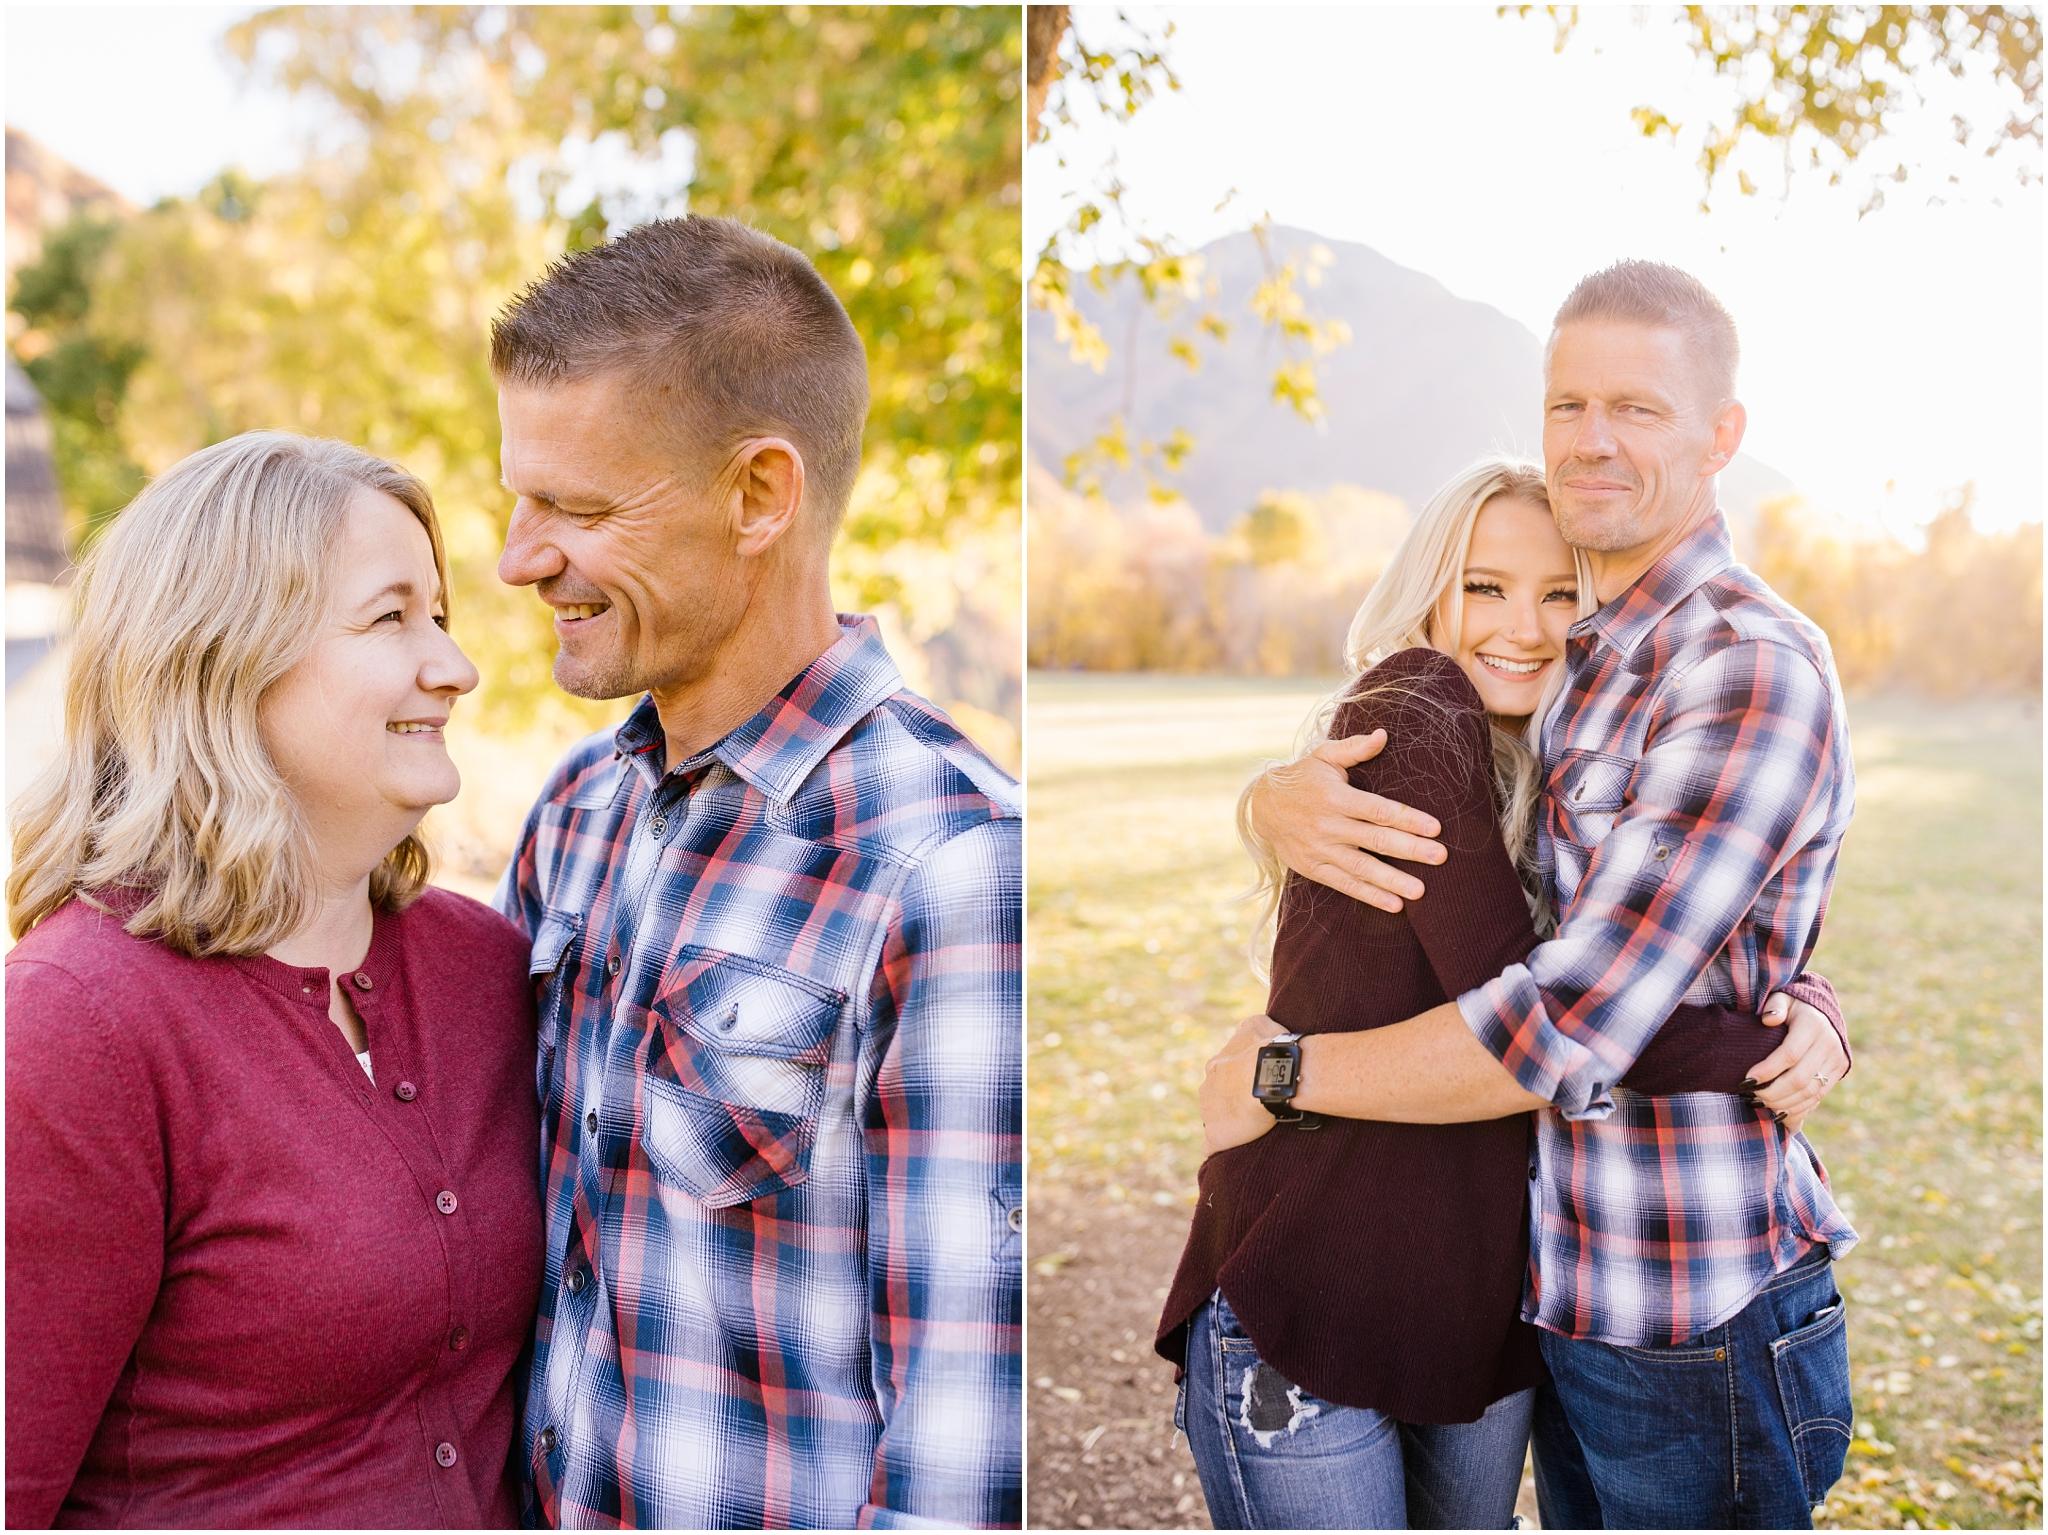 Nielsen--32_Lizzie-B-Imagery-Utah-Family-Photographer-Park-City-Salt-Lake-City-Hobble-Creek-Canyon-Jolleys-Ranch.jpg